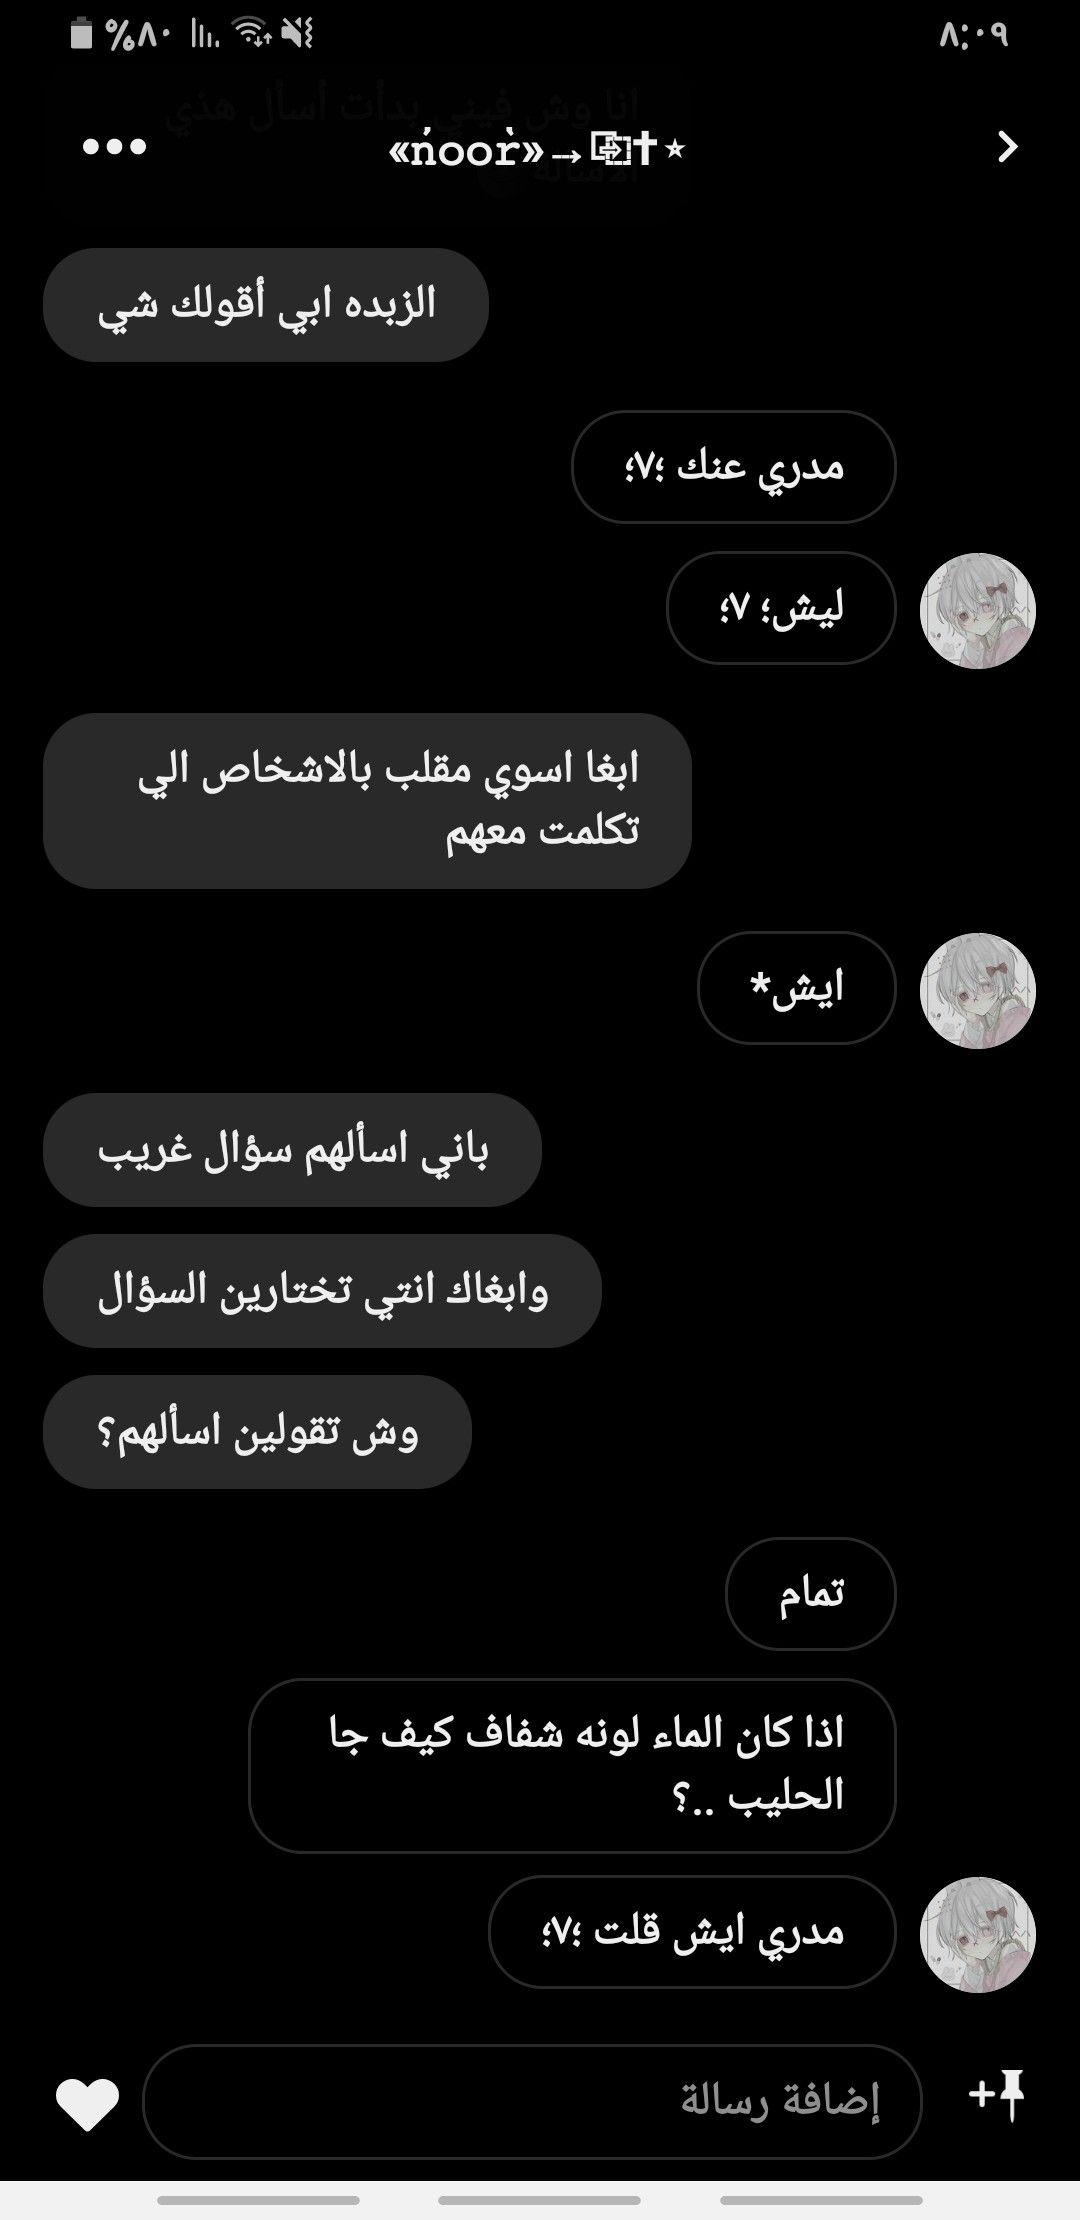 نقول بسم الله Lockscreen Screenshot Lockscreen Screenshots